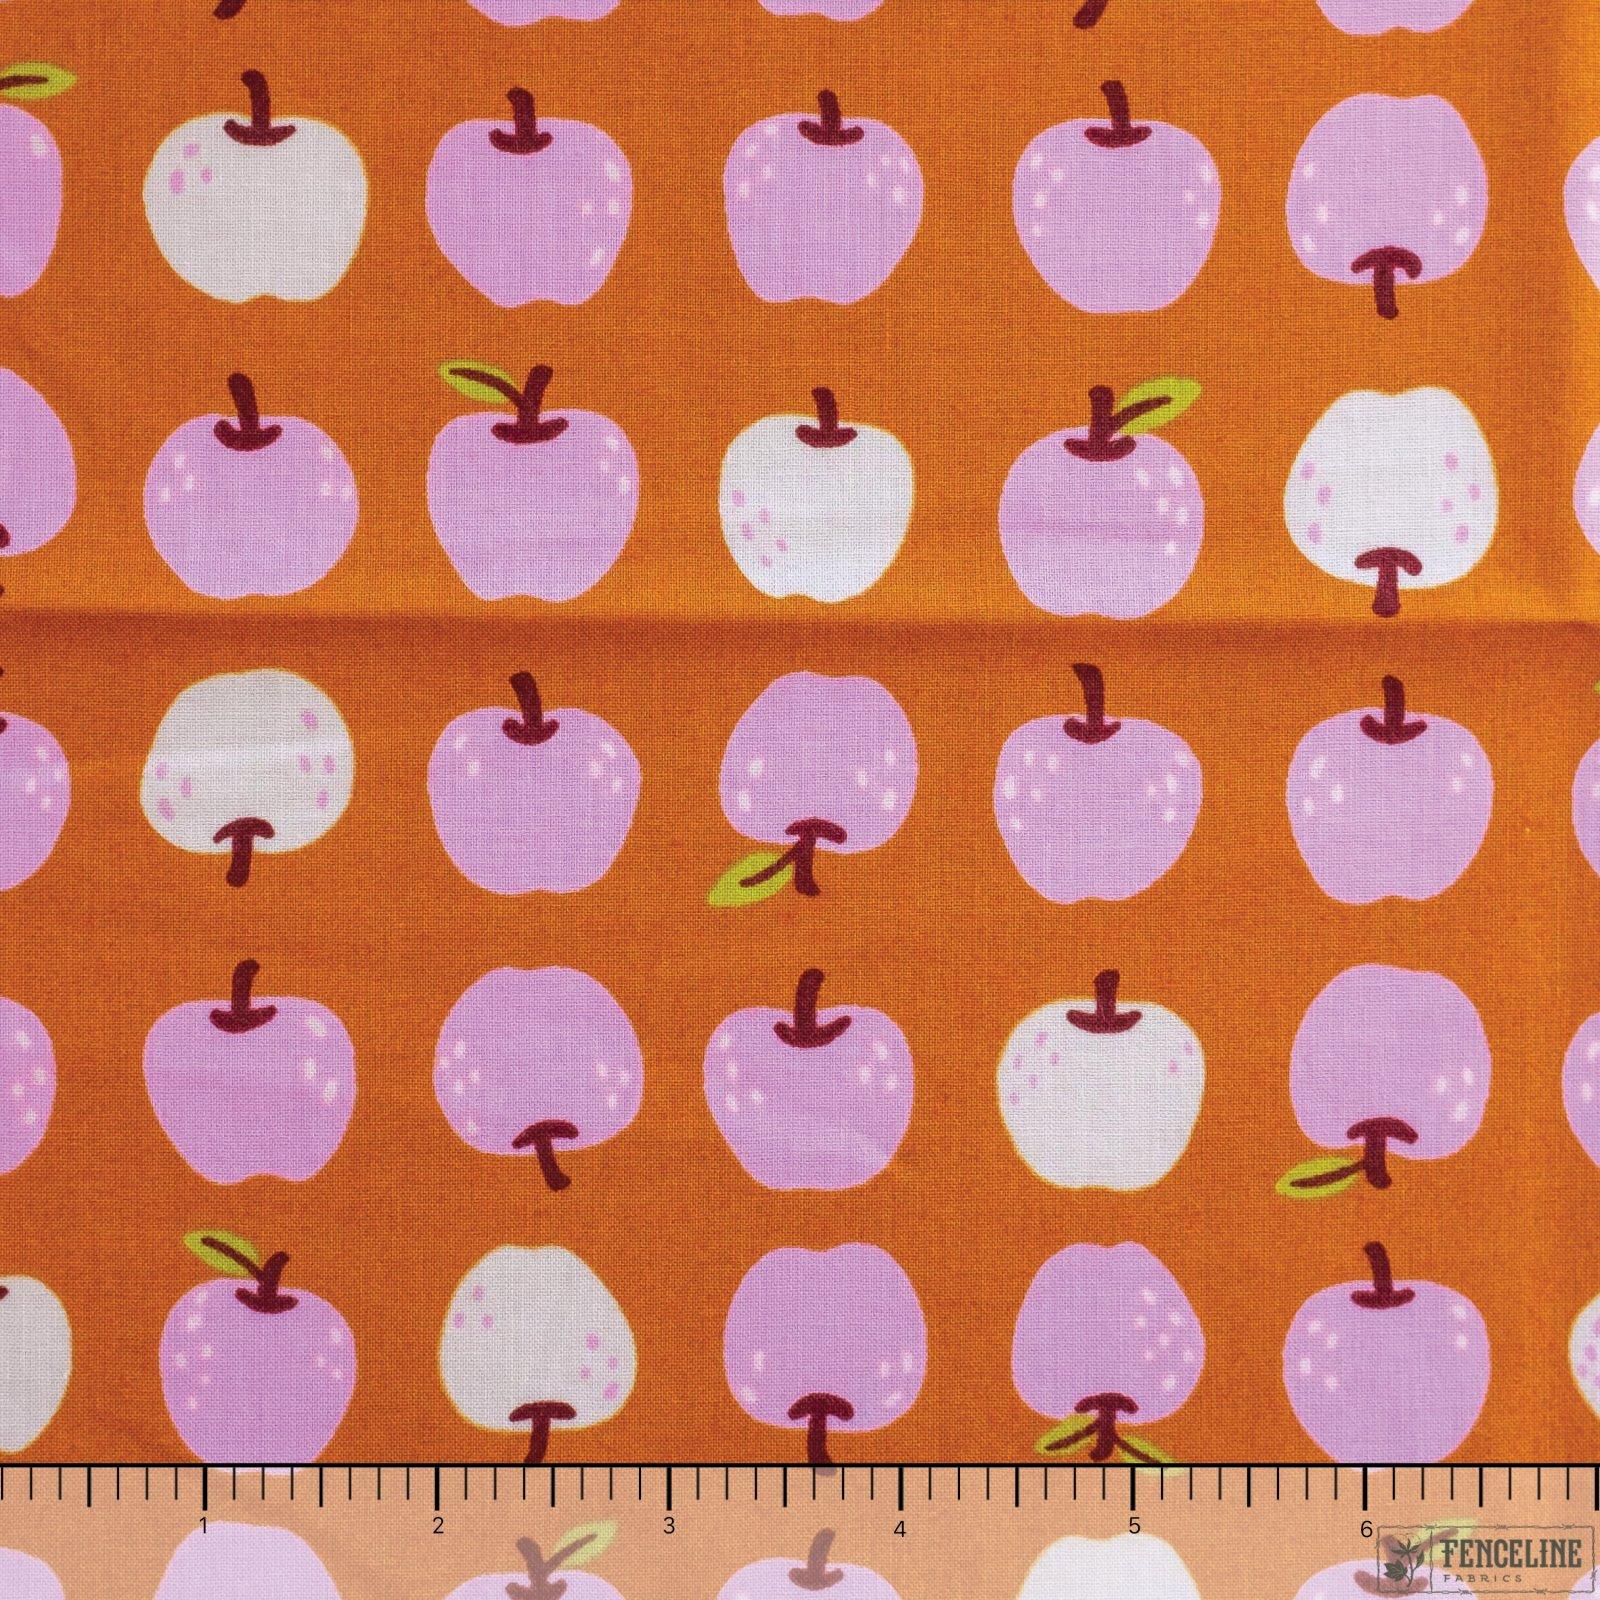 Them Apples, Caramel, Smol